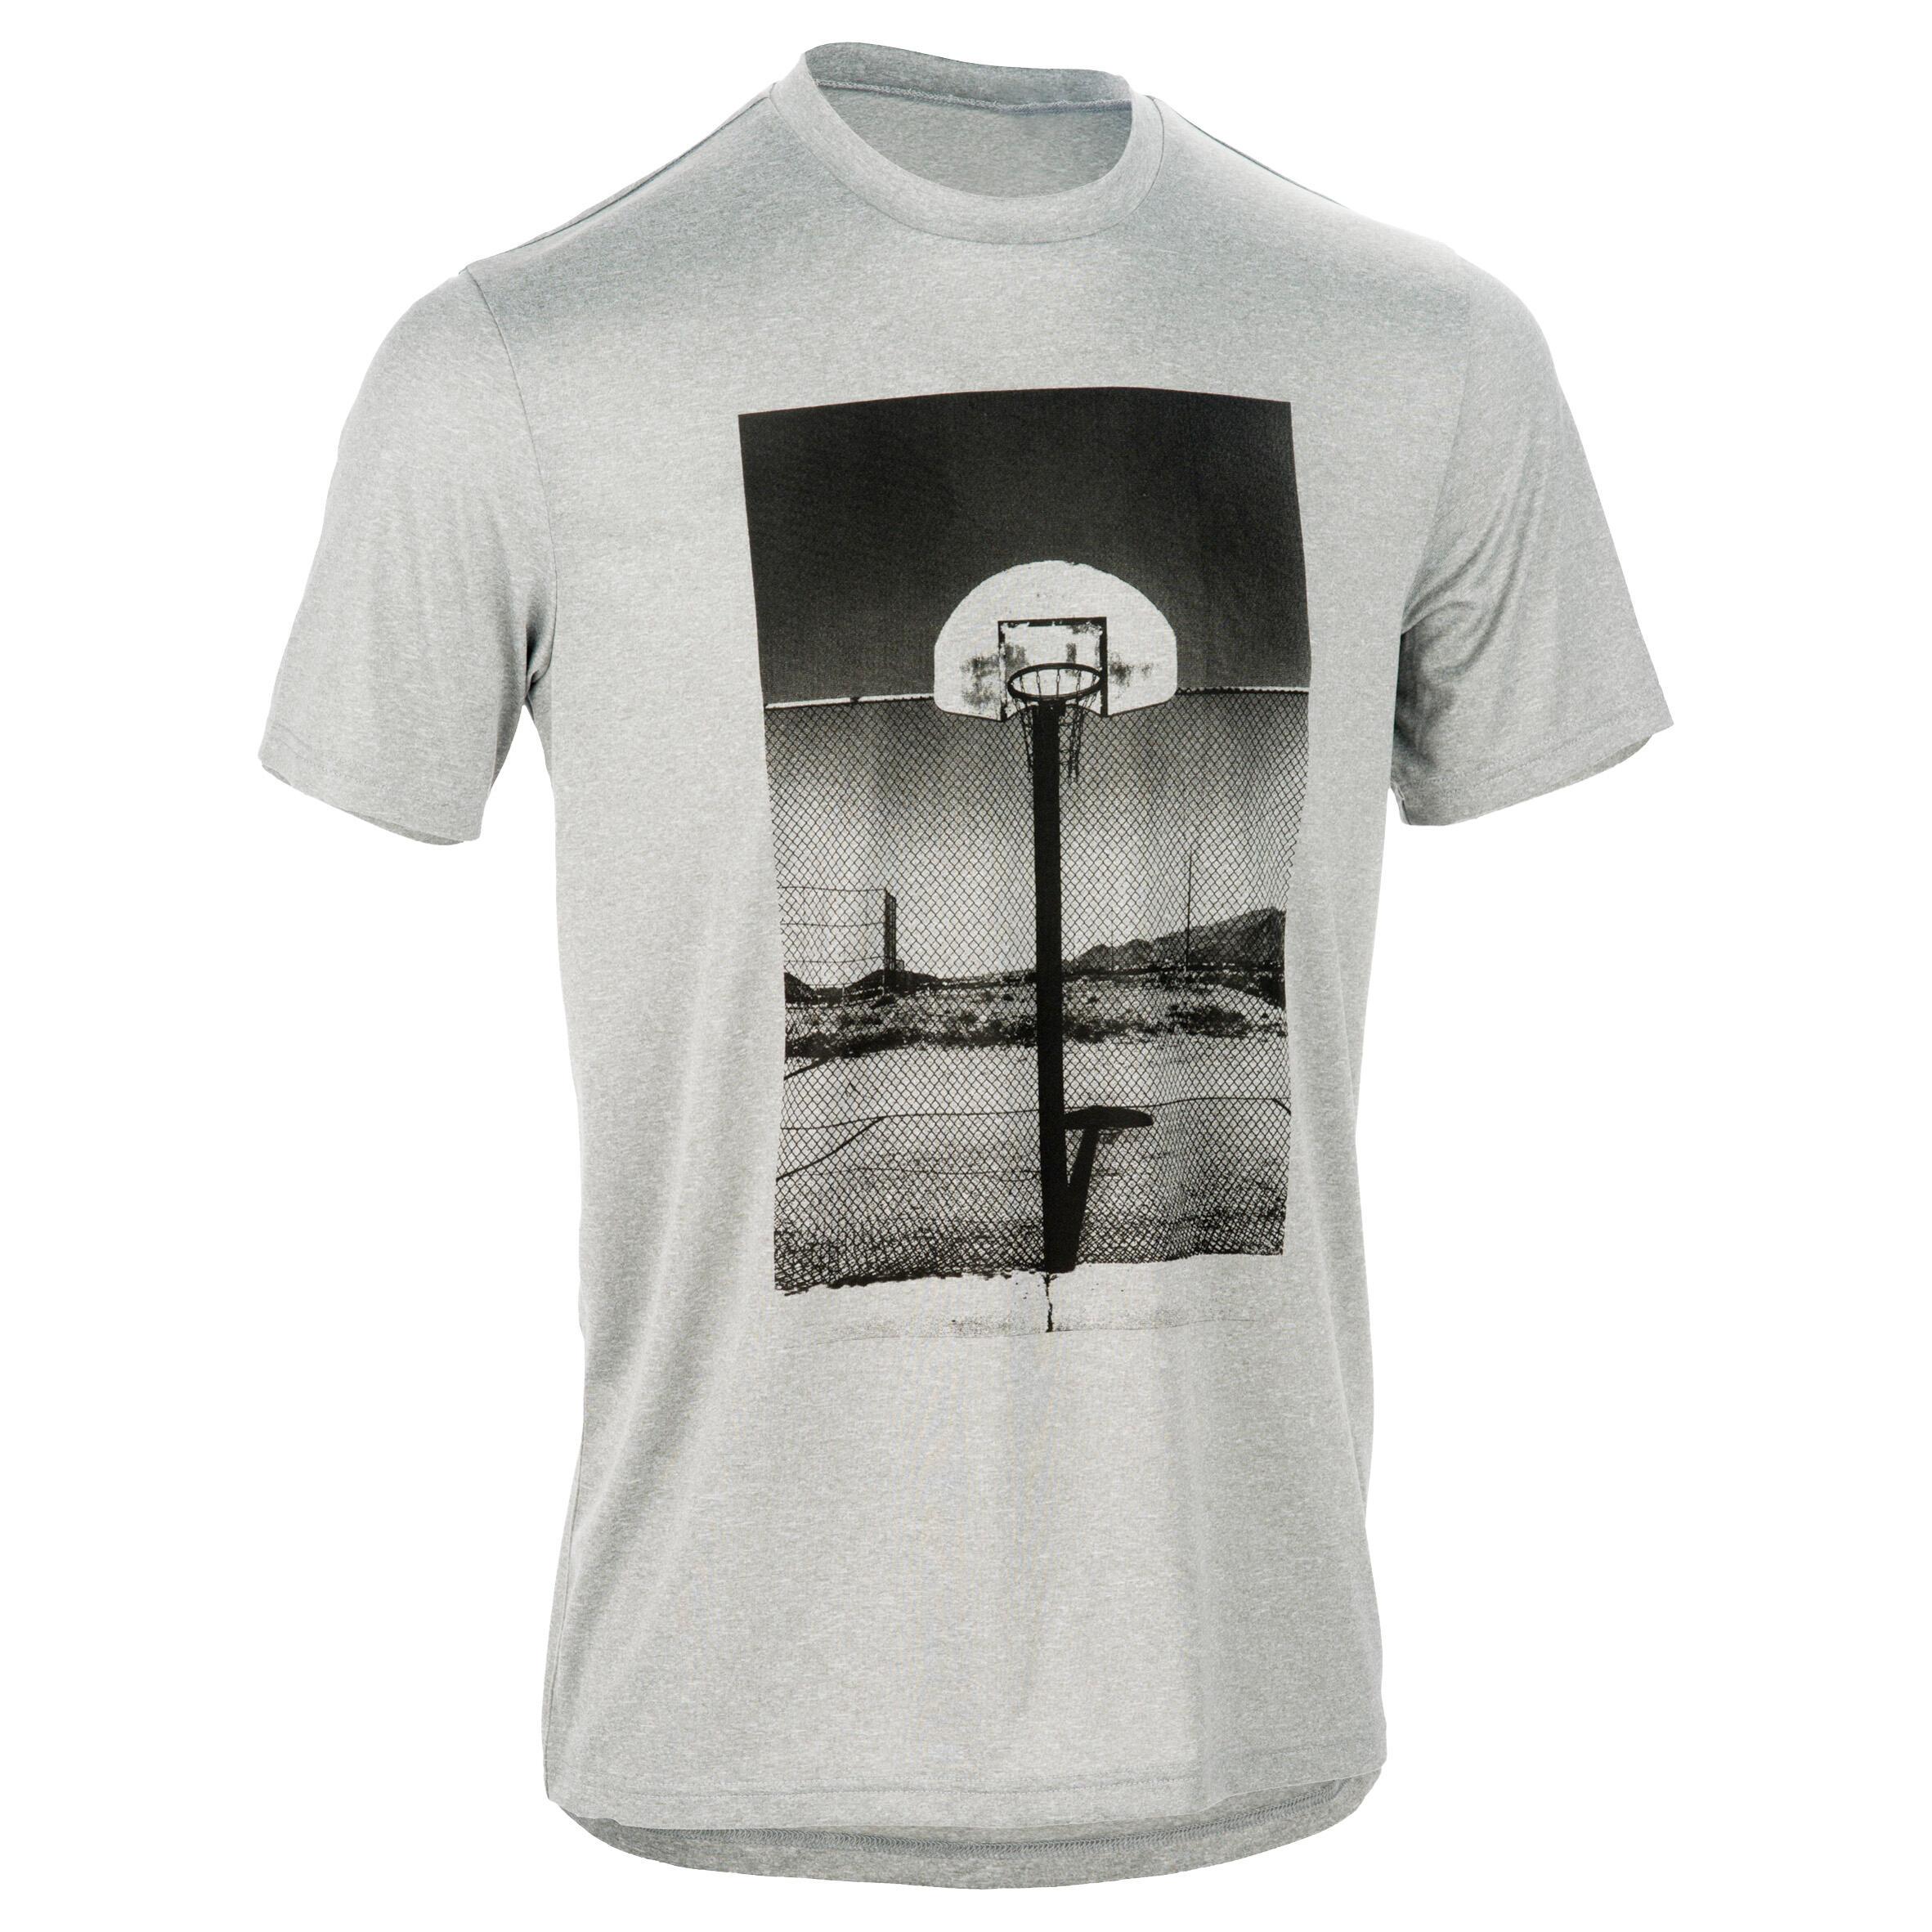 Tarmak Basketbal T-shirt Fast Playground